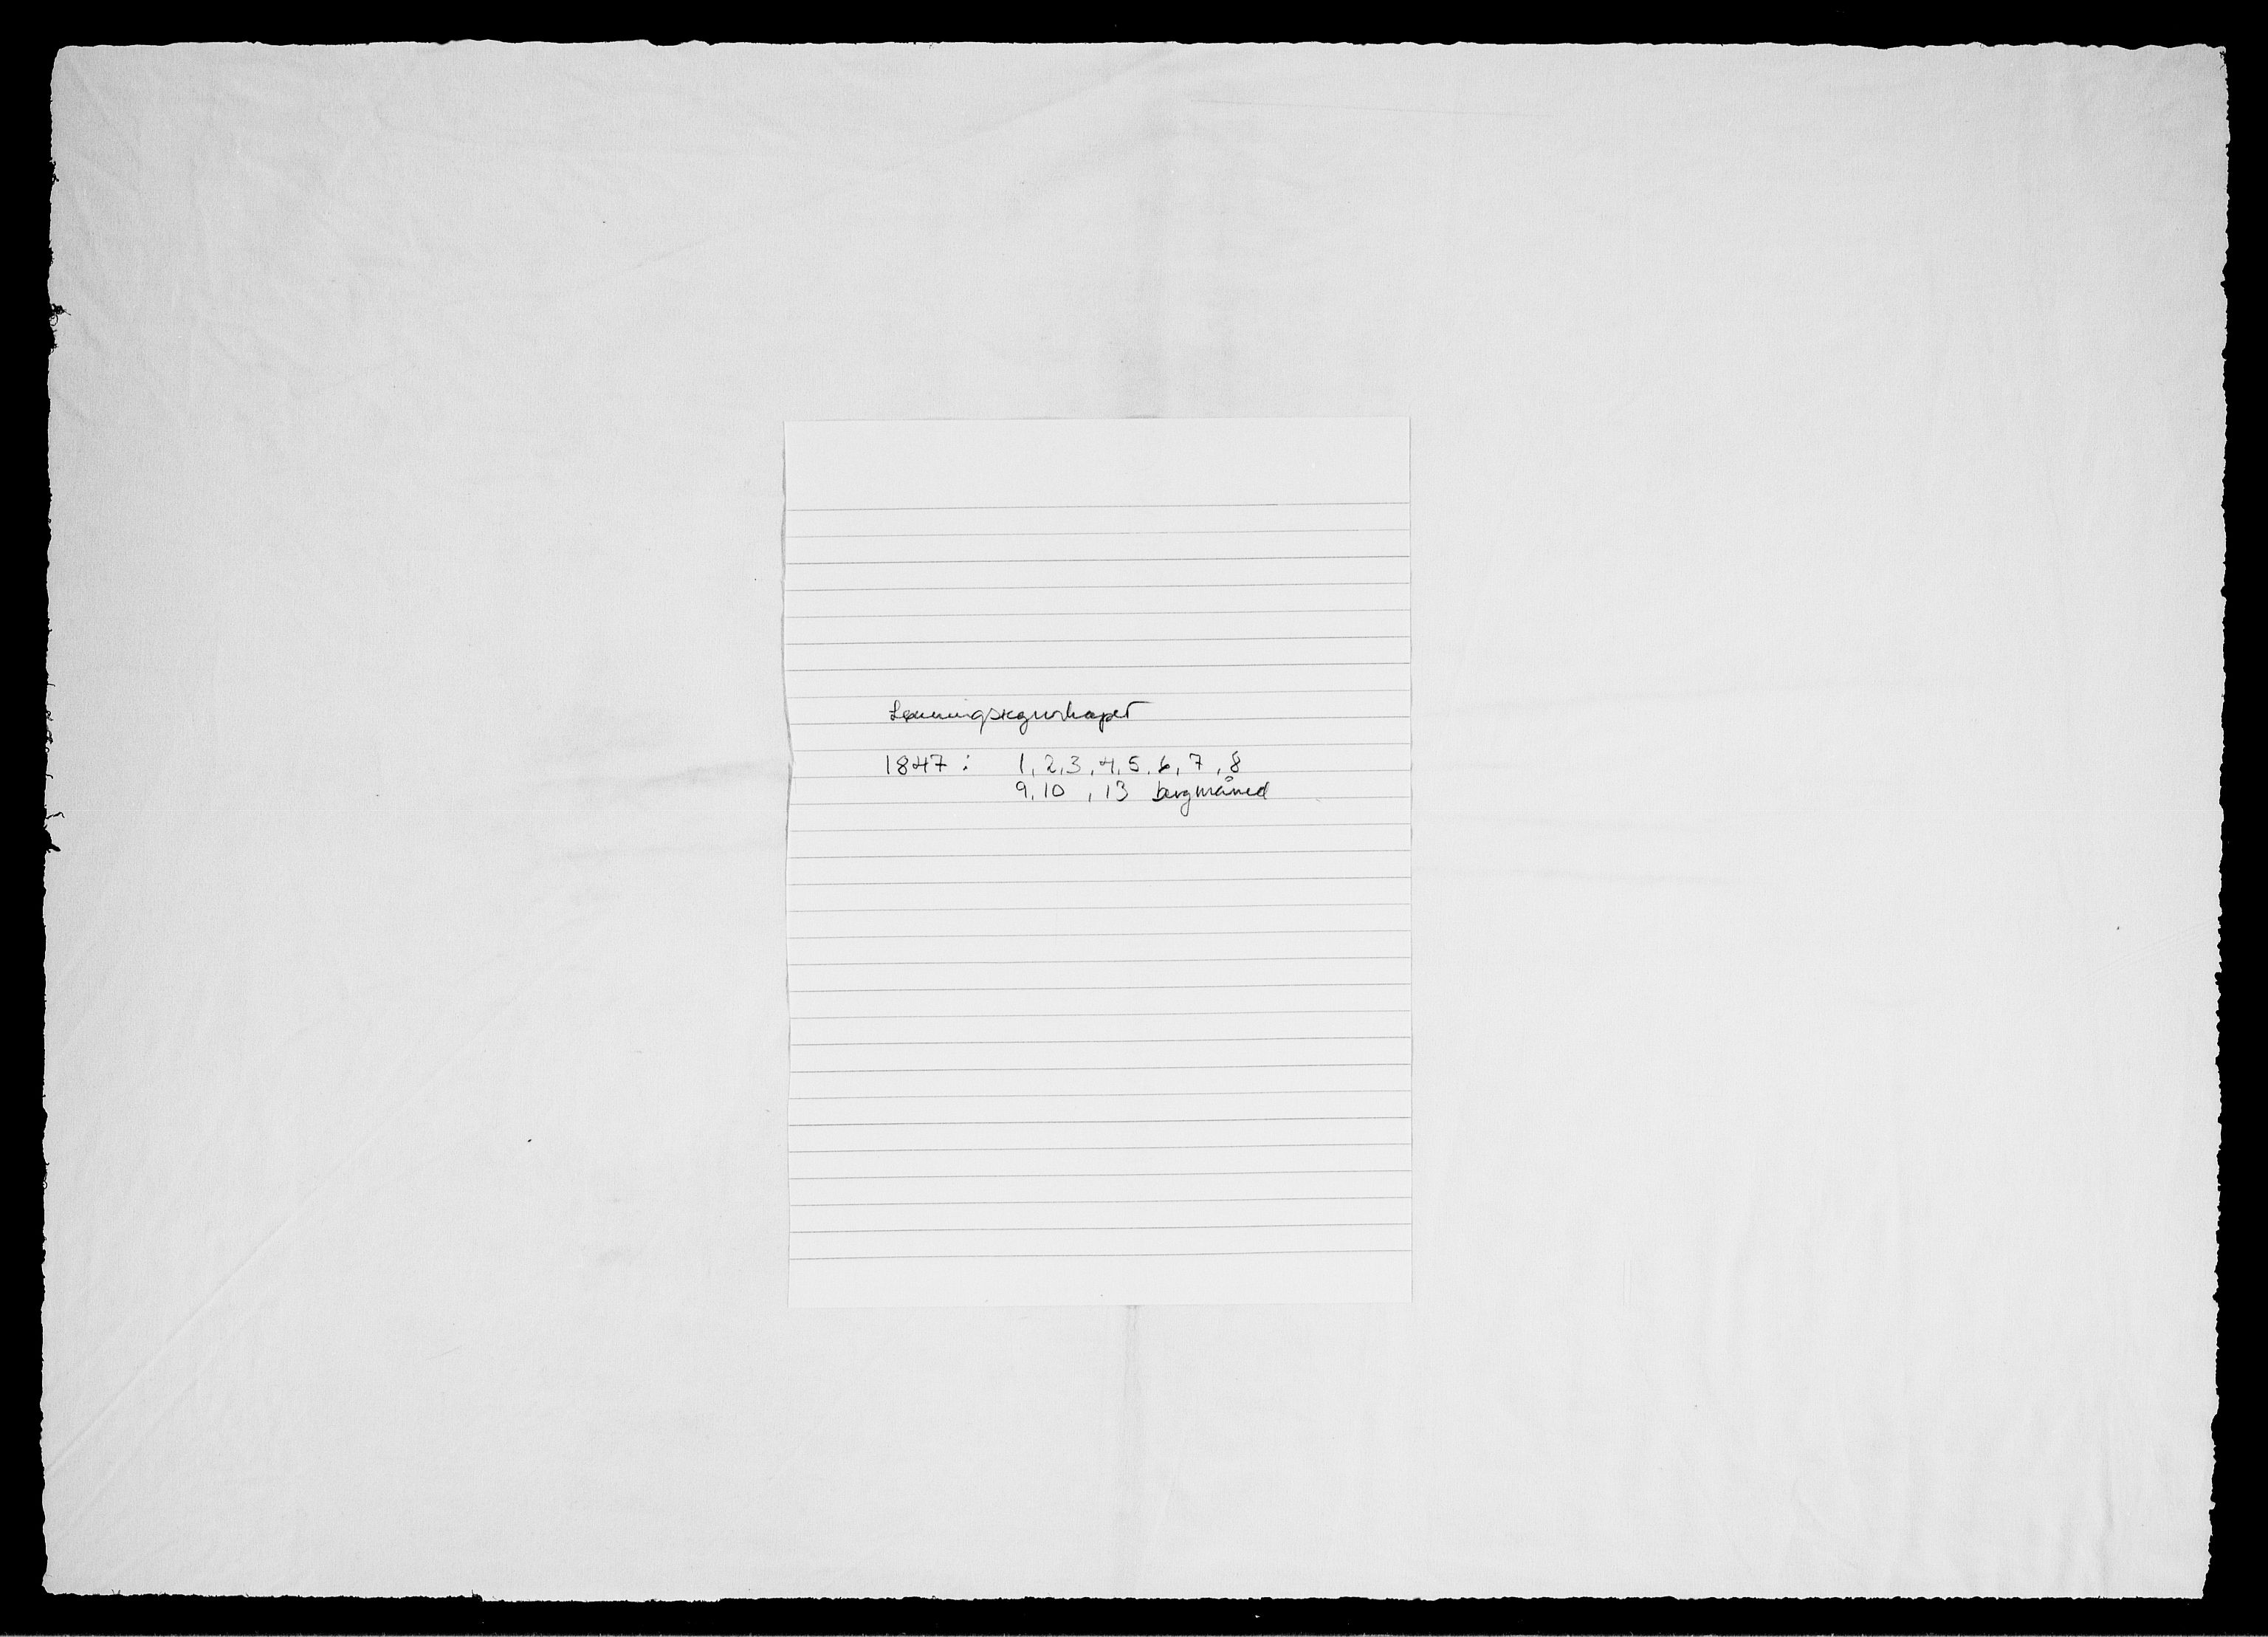 RA, Modums Blaafarveværk, G/Gd/Gdd/L0283, 1847, s. 2